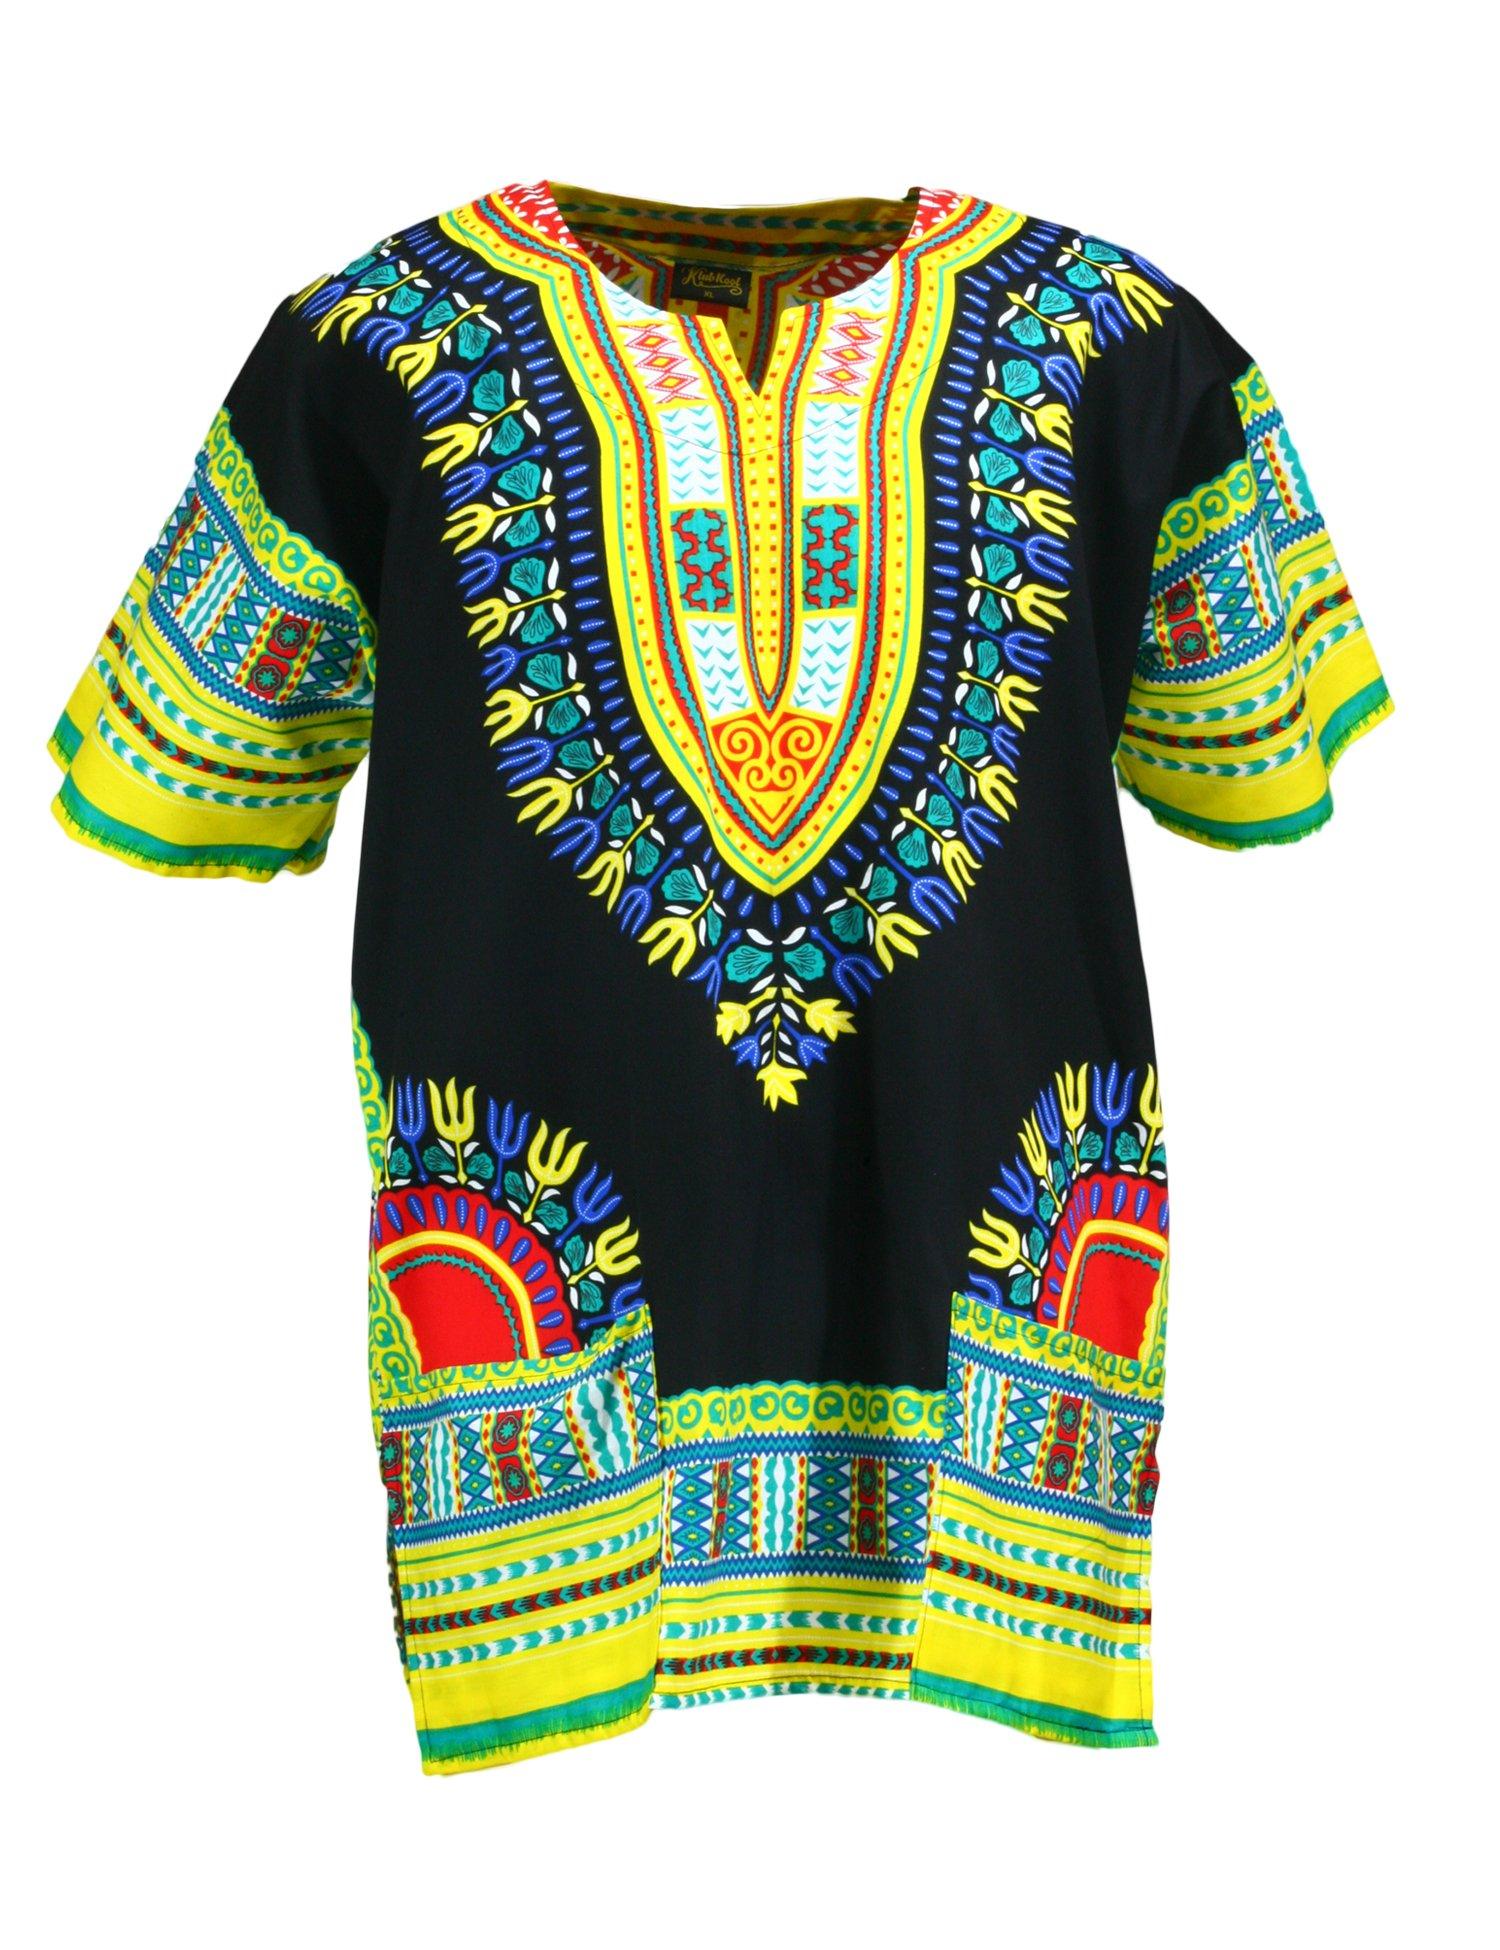 KlubKool Dashiki Shirt Tribal African Caftan Boho Unisex Top Shirt (Black/Yellow/Green,Medium)